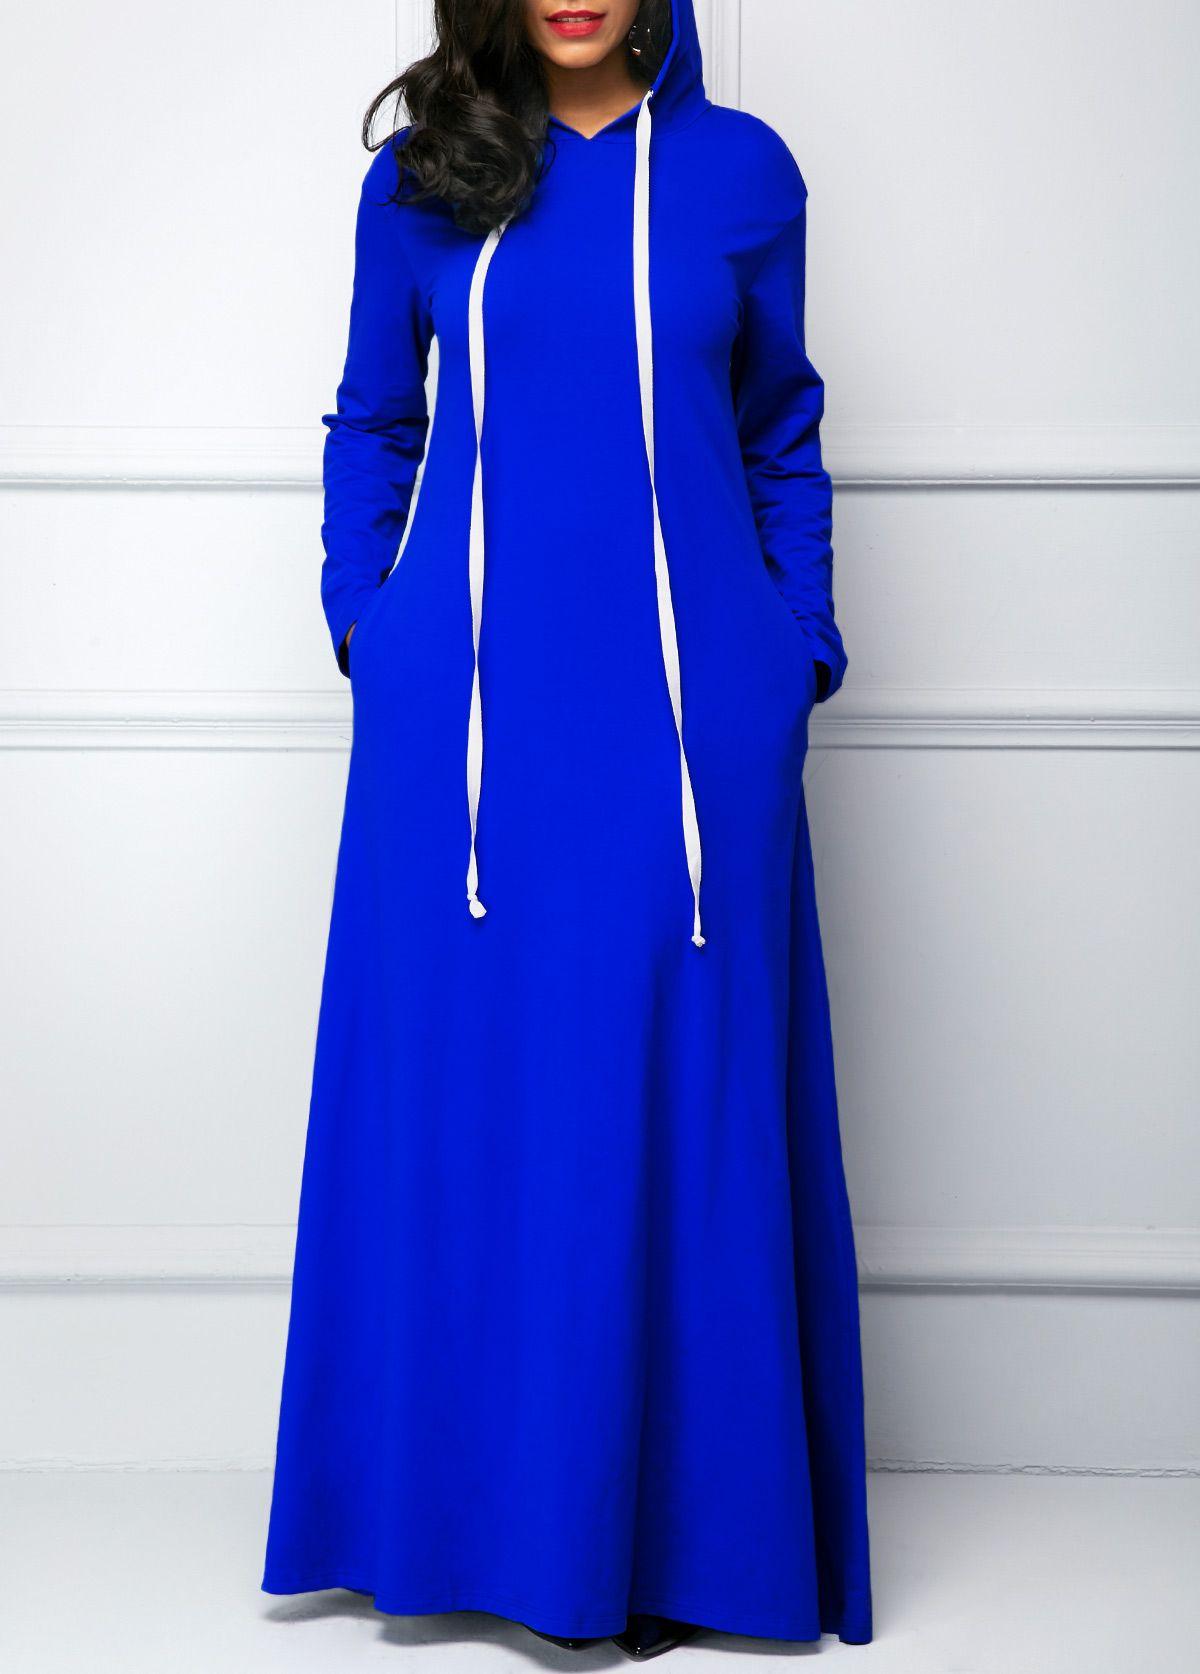 Hooded Collar Royal Blue Long Sleeve Maxi Dress liligal USD